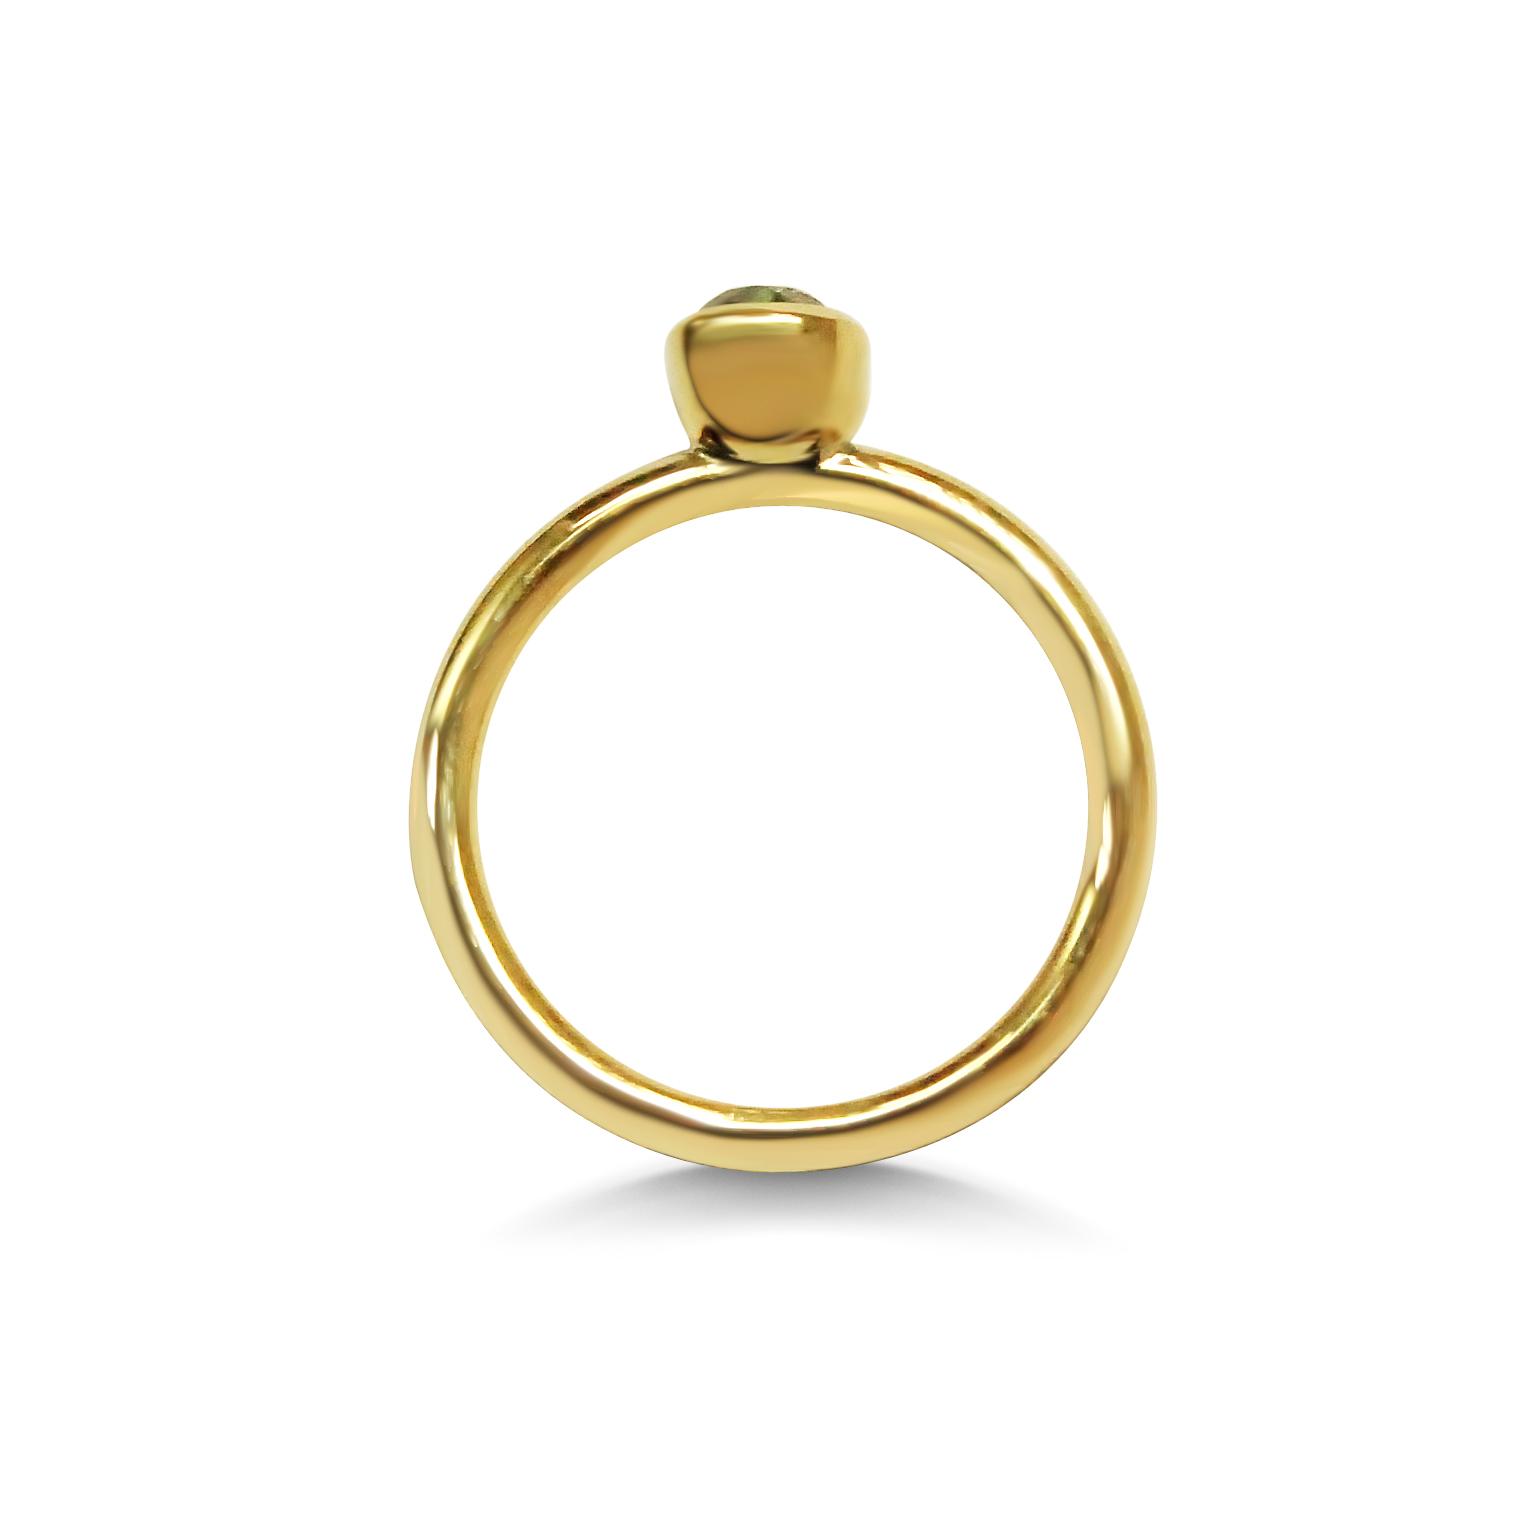 old-cut-diamond-18ct-yellow-gold-stacking-ring-2.jpg